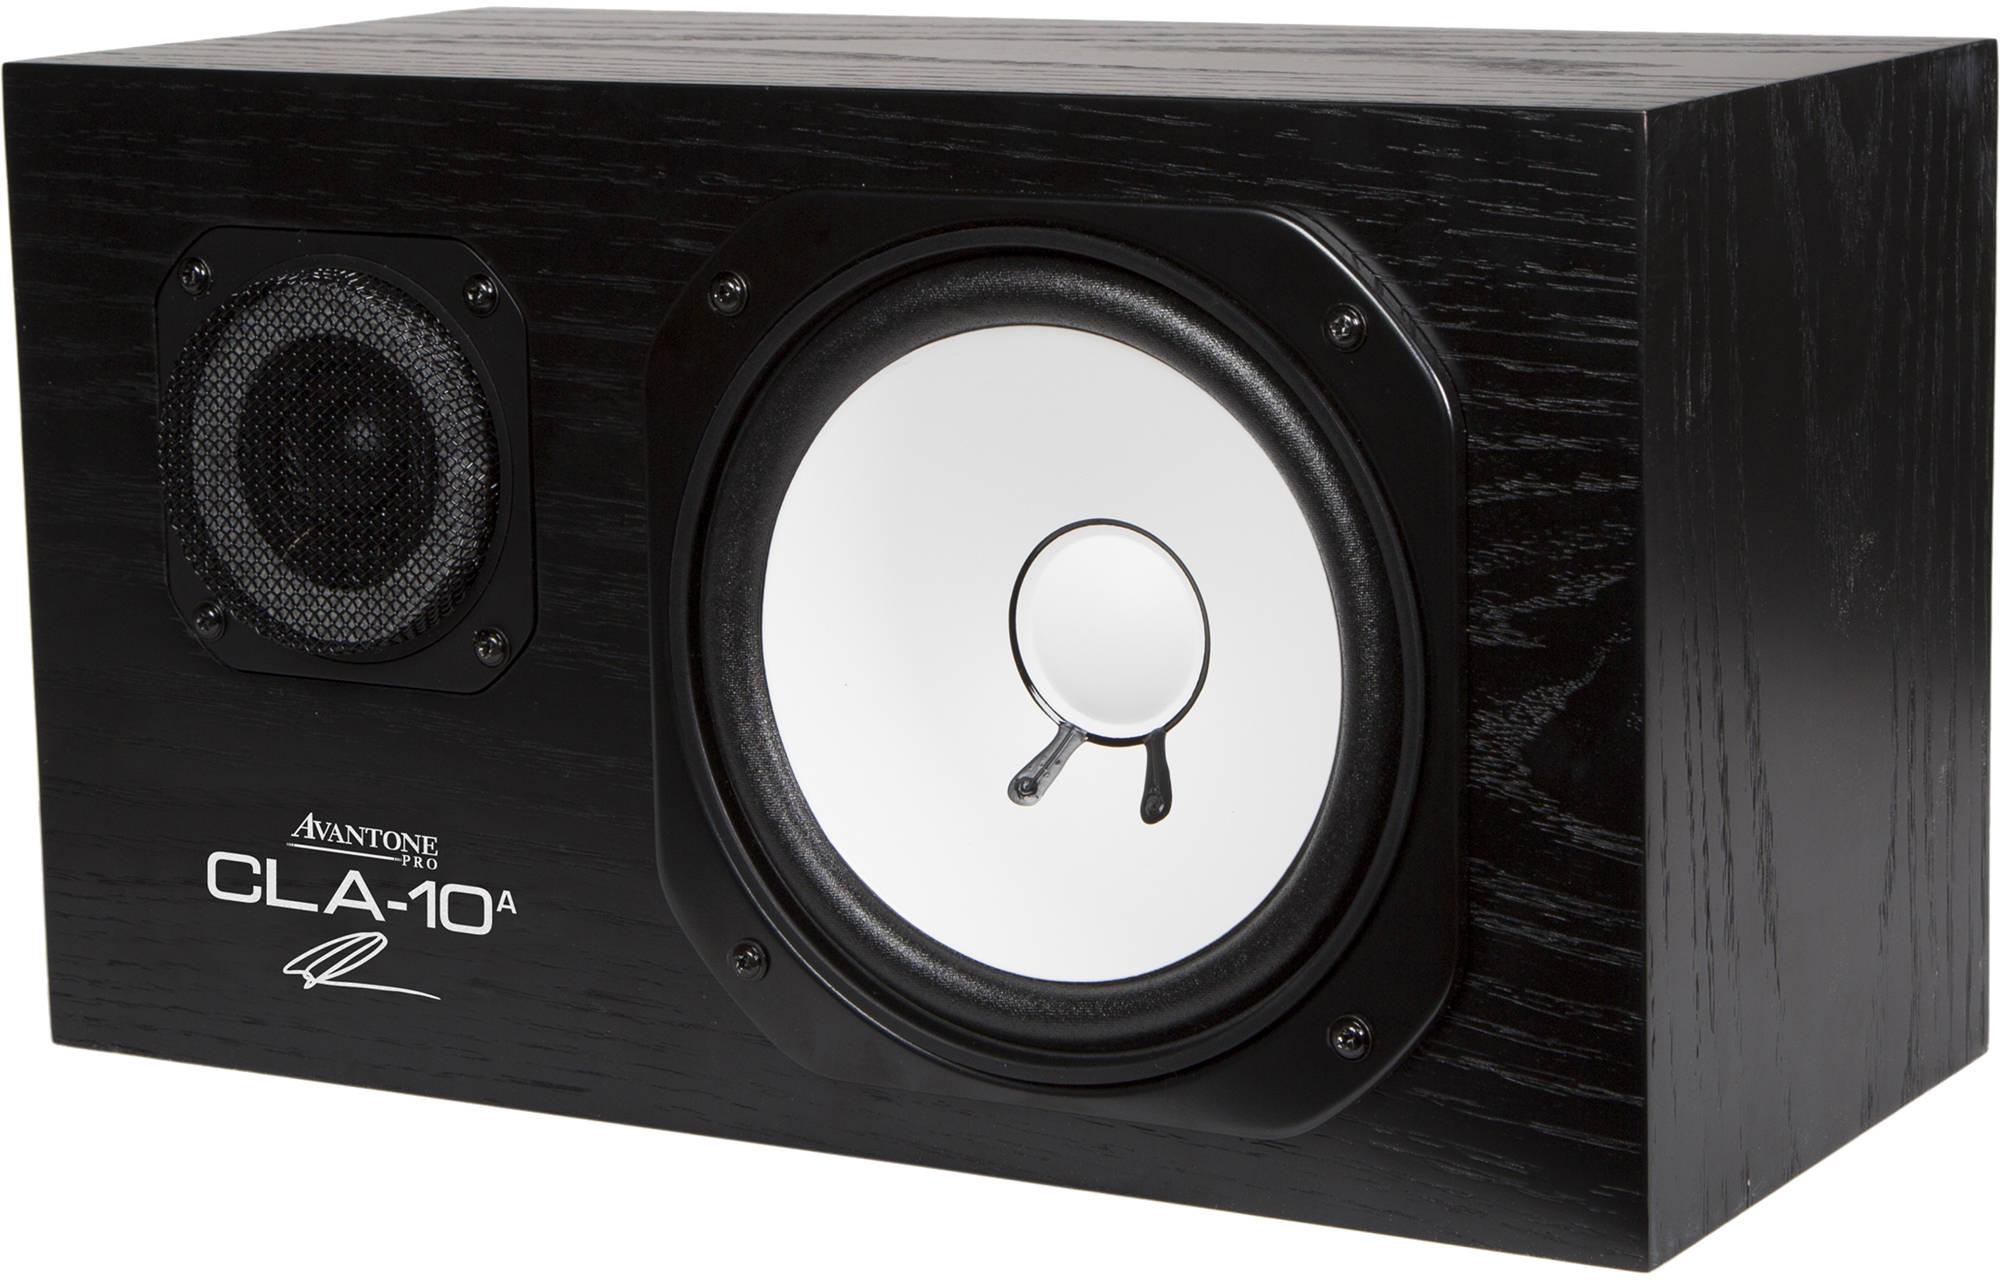 Avantone Pro CLA-10A Chris Lord Alge Active Studio Monitors